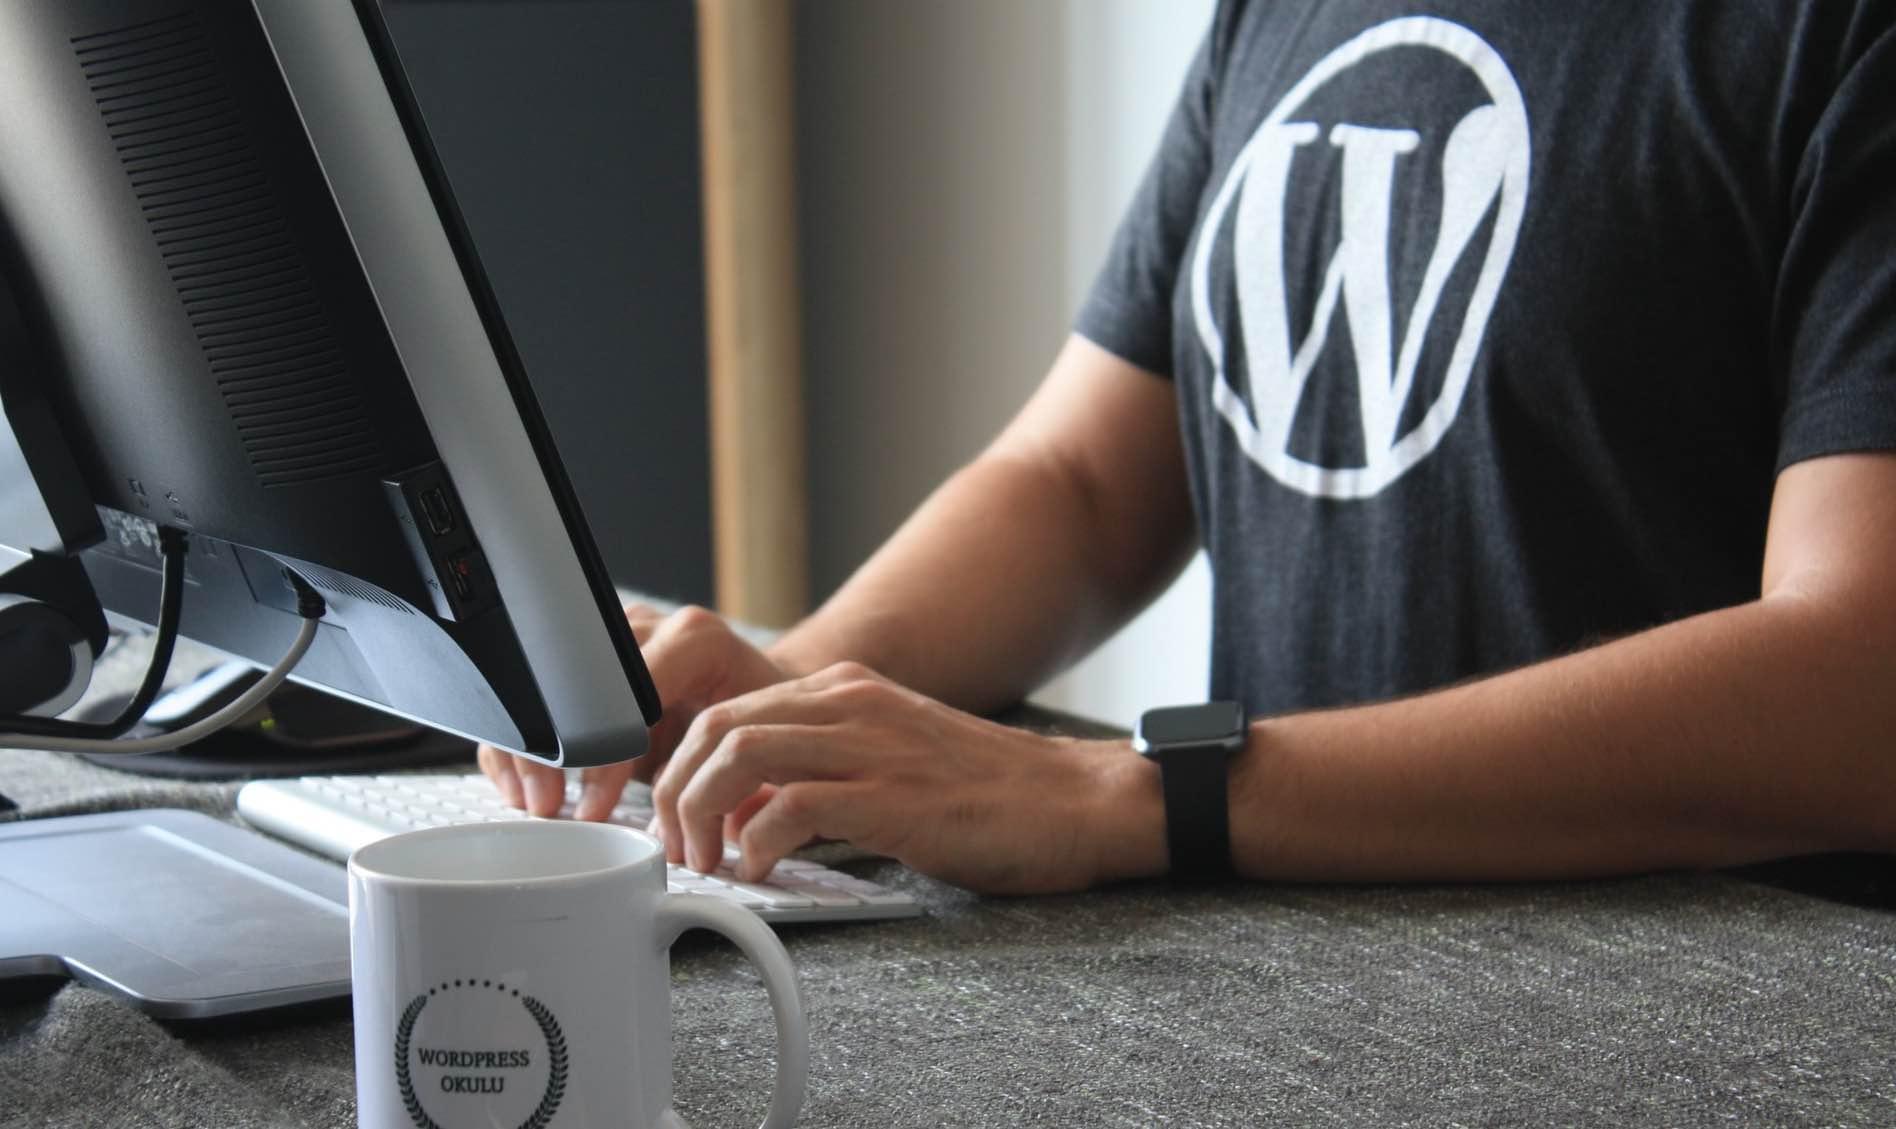 wordpress ethereum